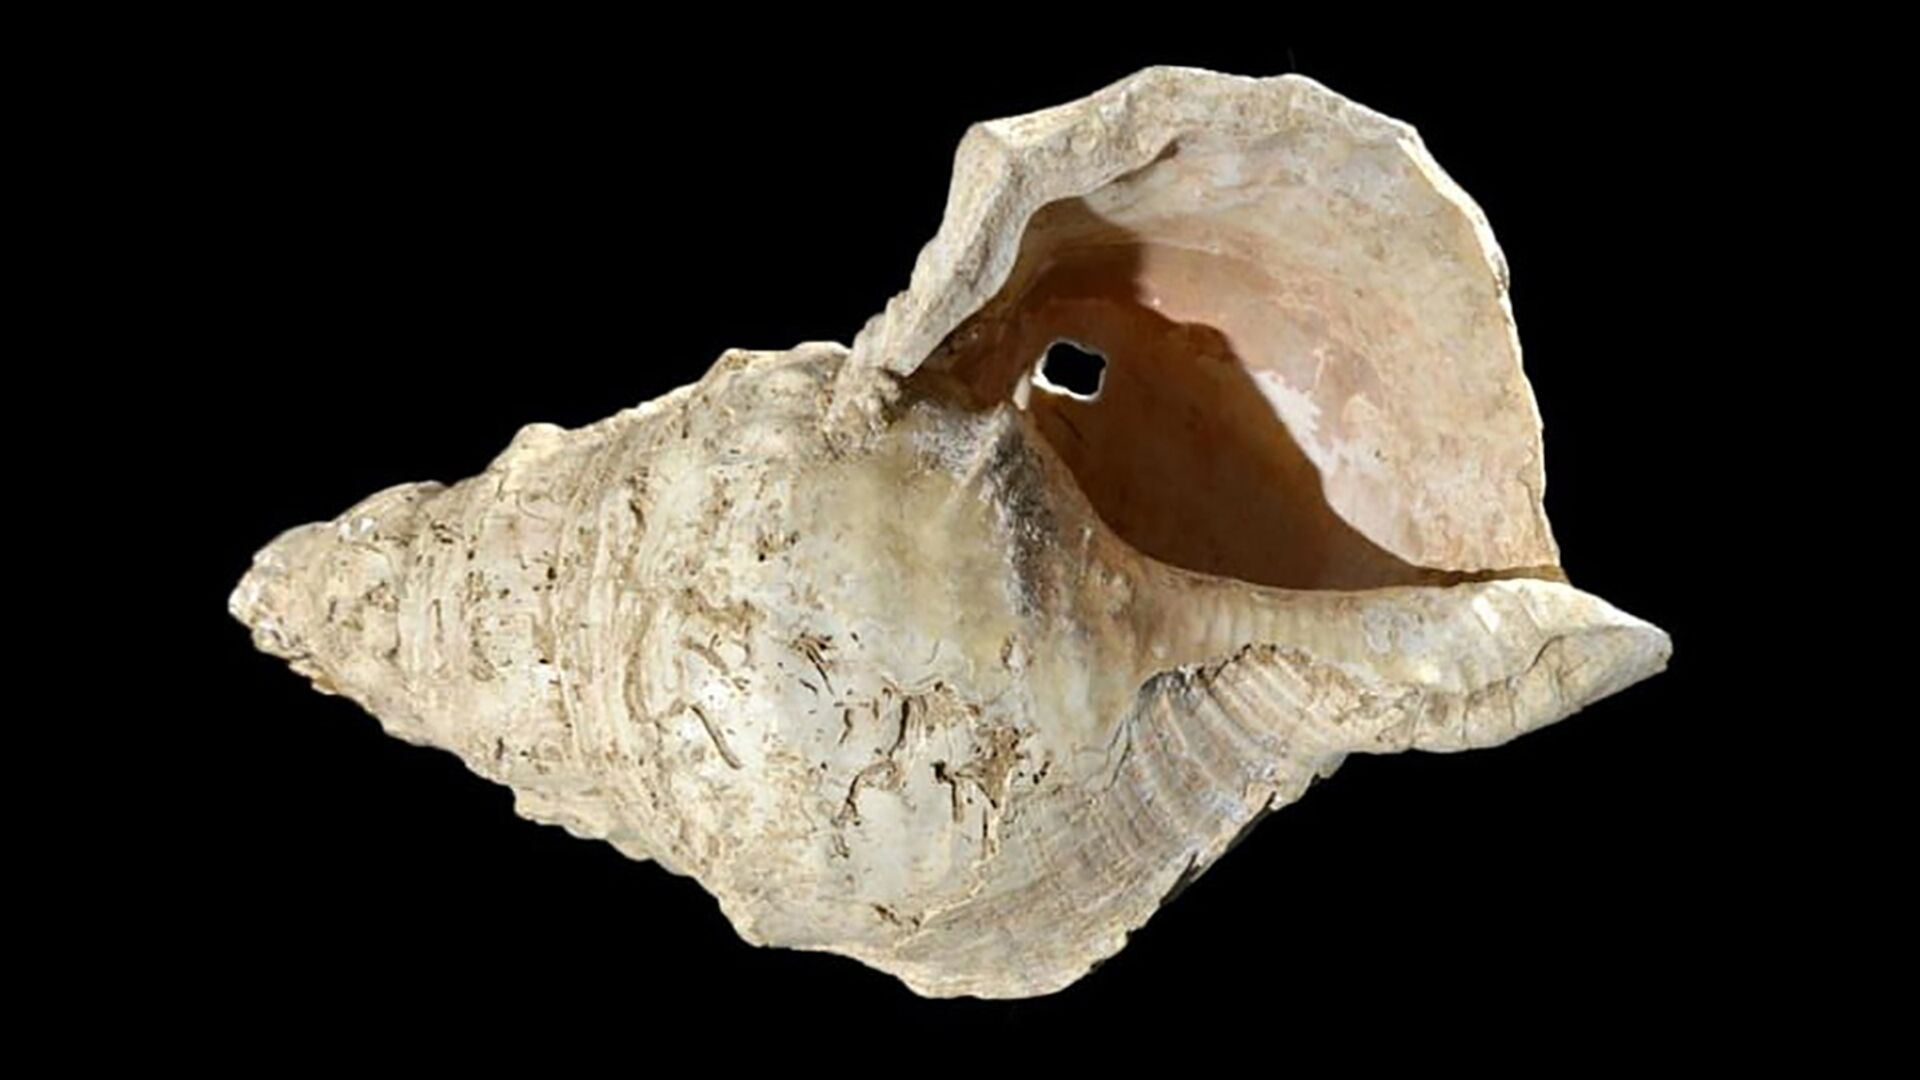 Раковина, найденная в пещере Марсулас, Франция - РИА Новости, 1920, 12.02.2021